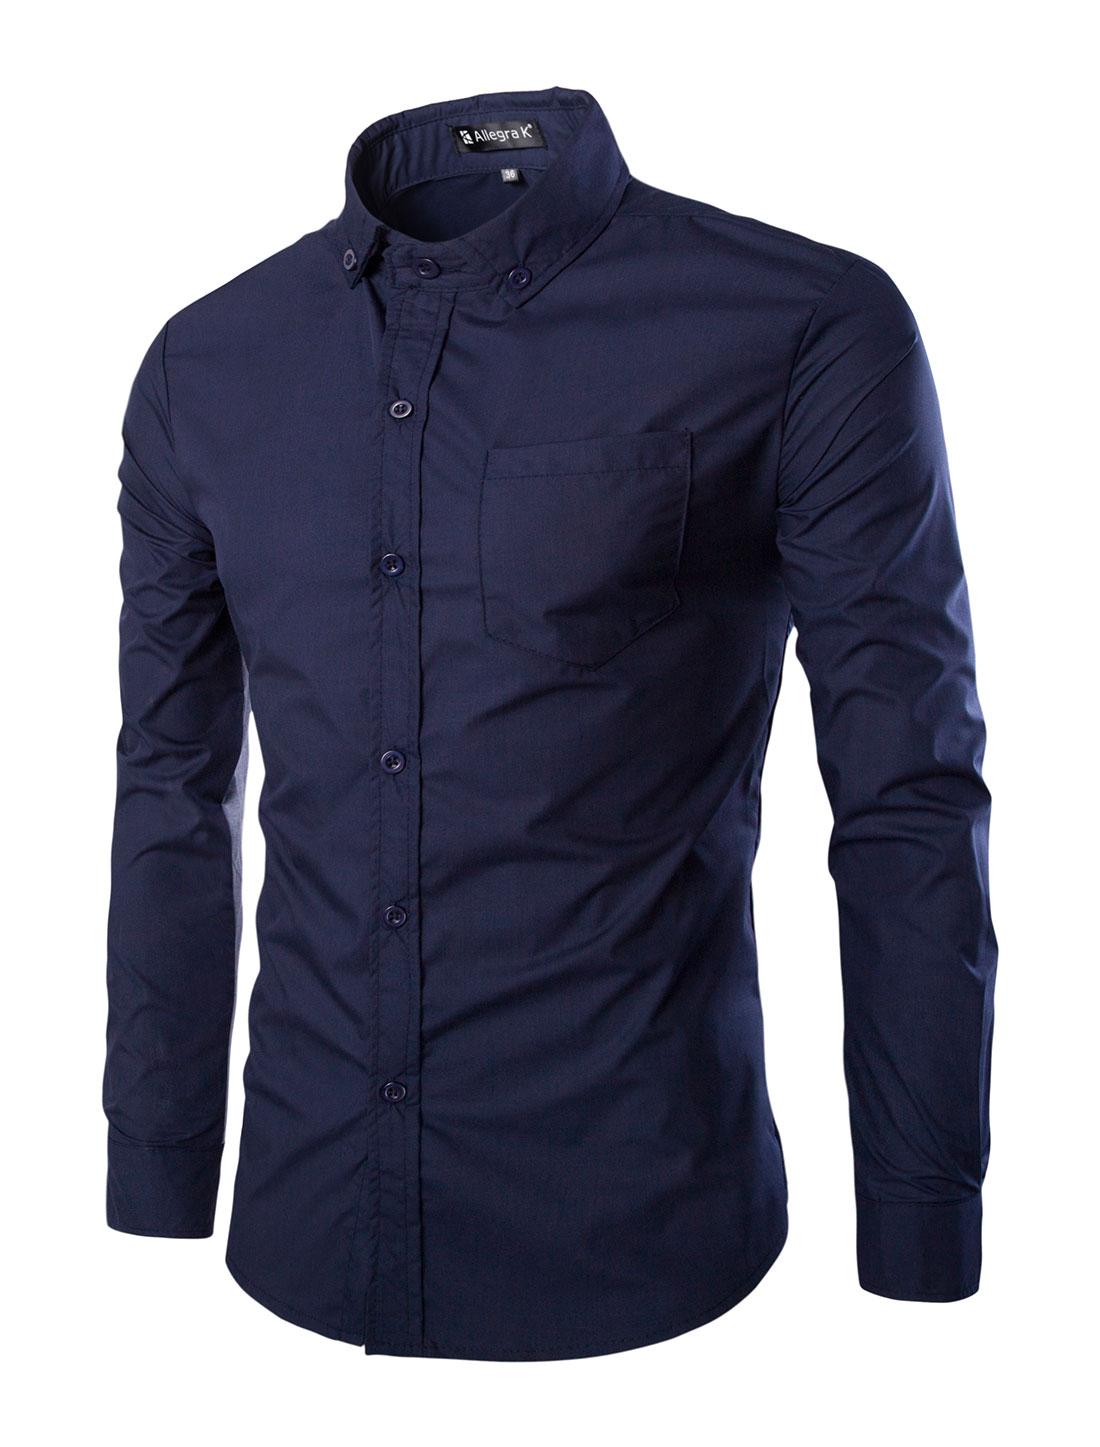 Men Contrast Color Long Sleeves Button Down Shirt w Pocket Blue L